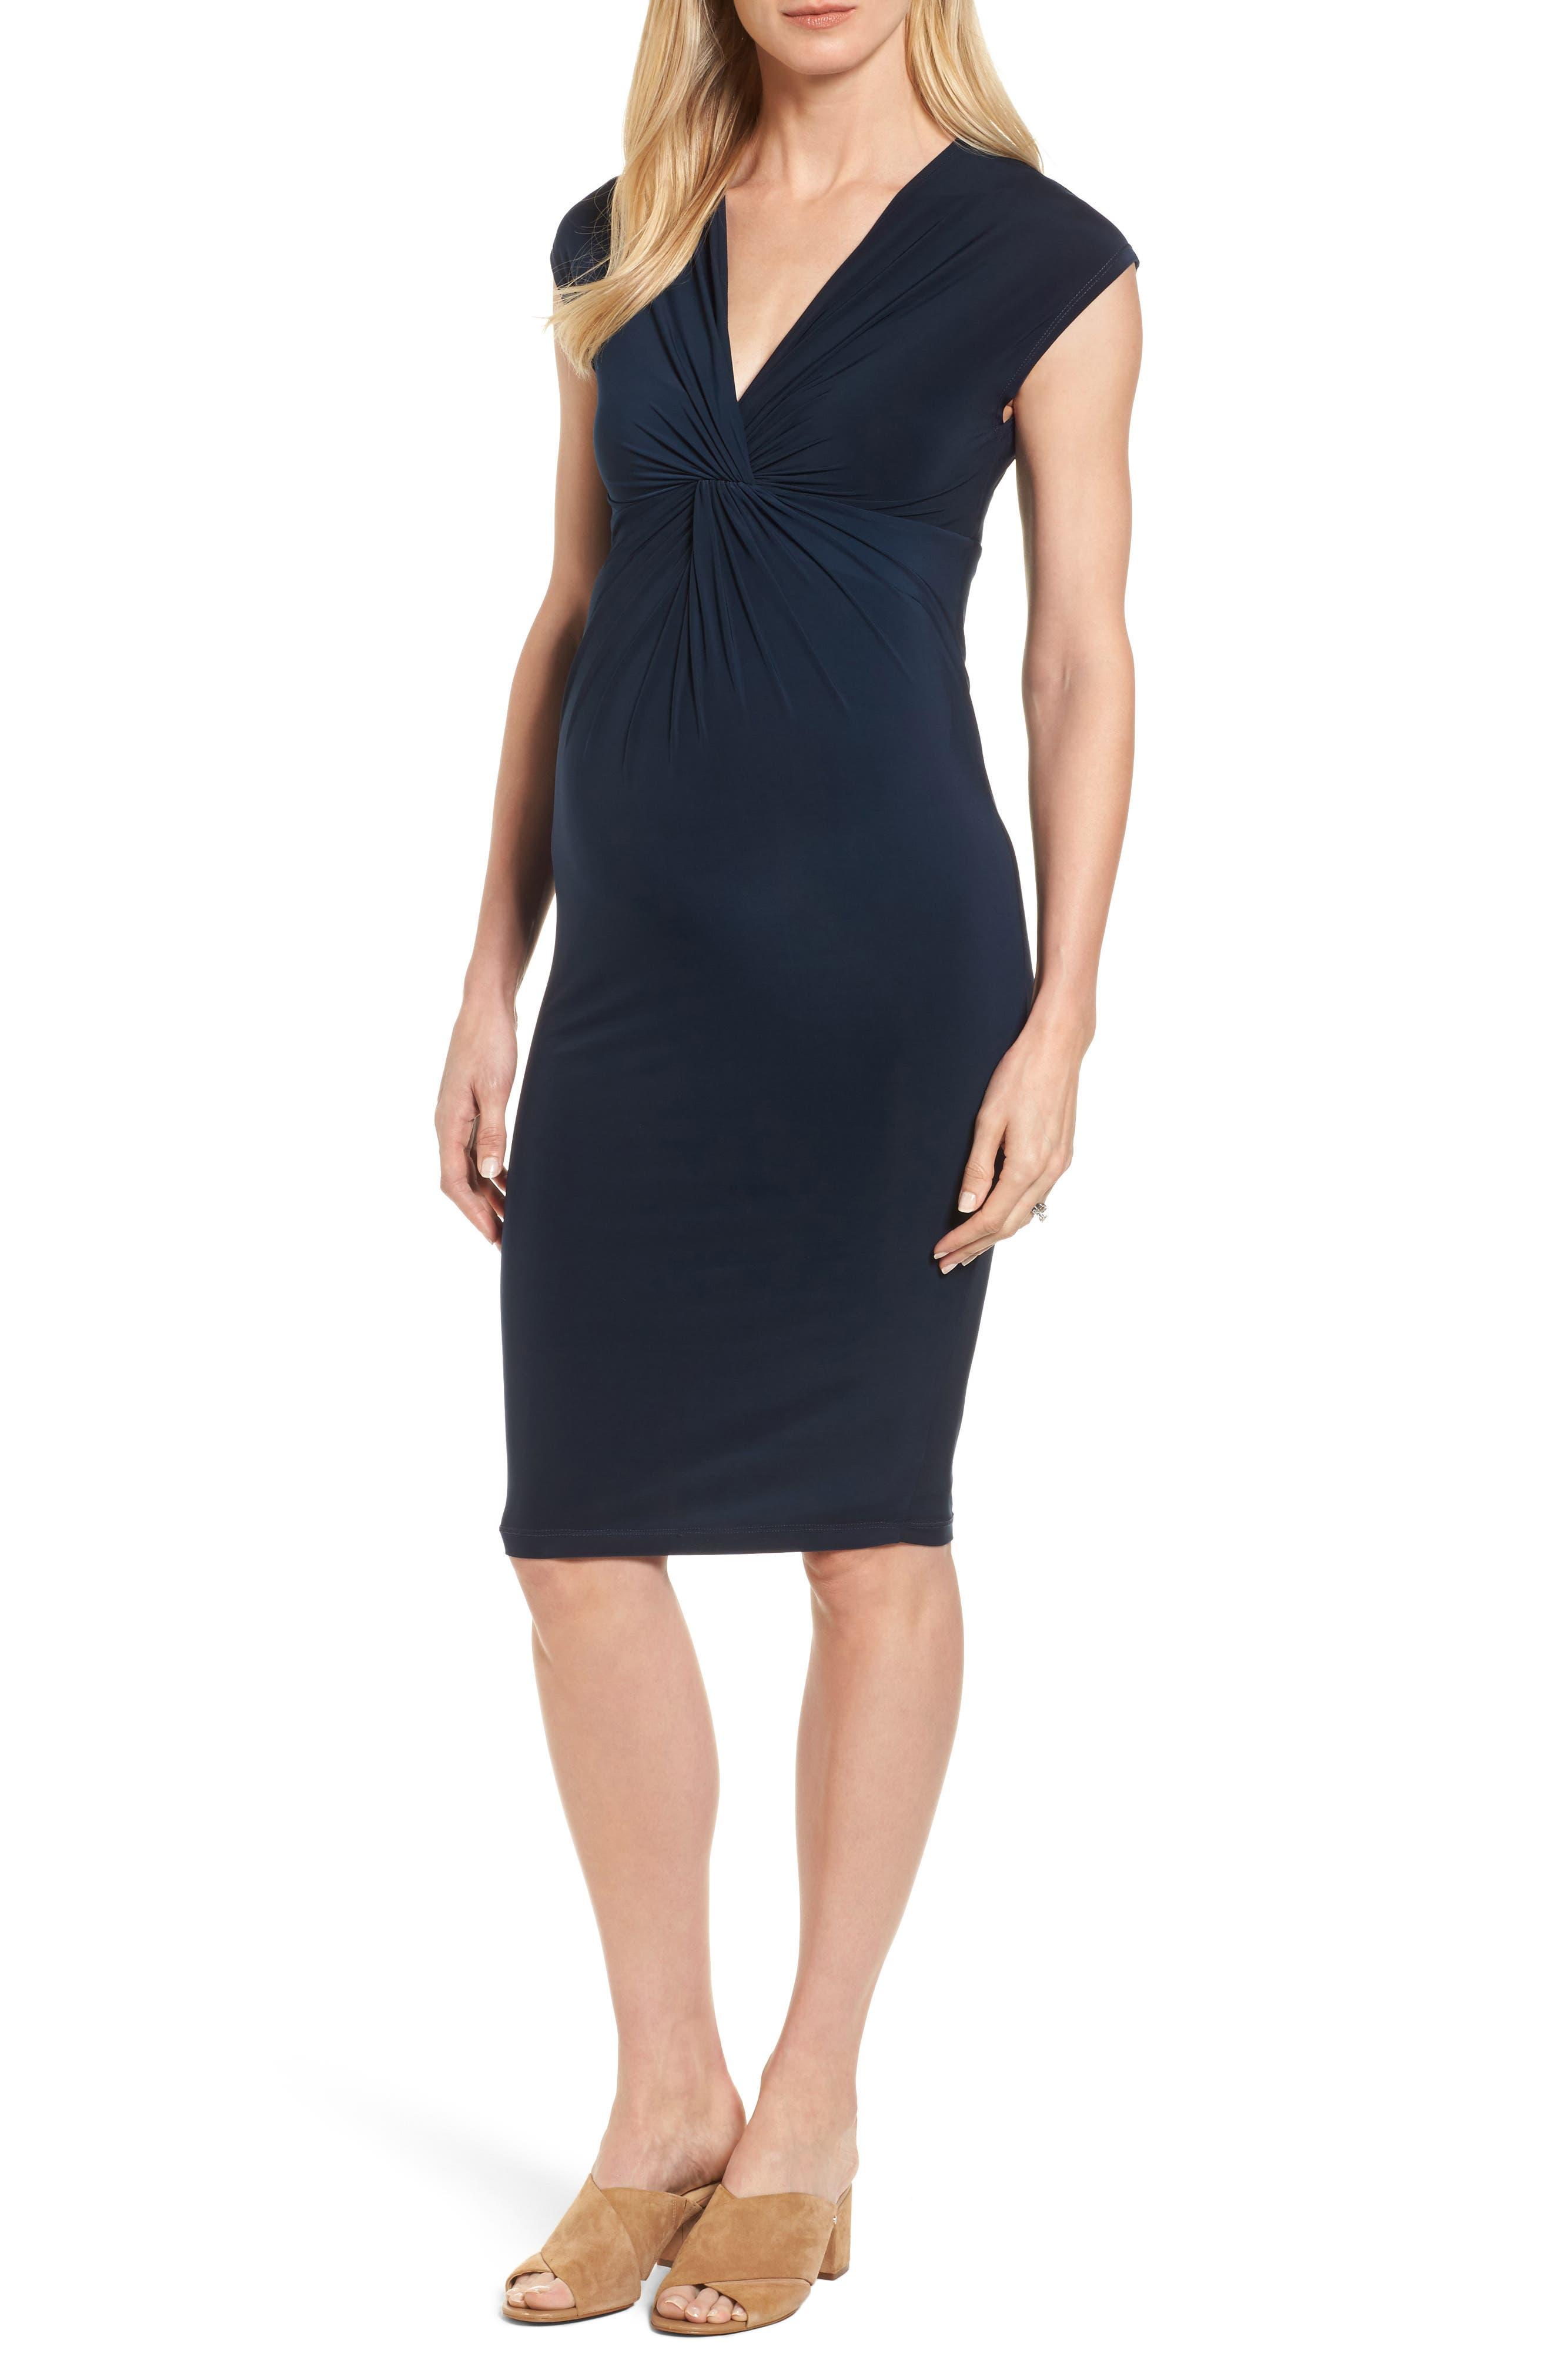 'Carla' Knot Front Jersey Maternity Dress,                             Main thumbnail 1, color,                             Darkest Navy